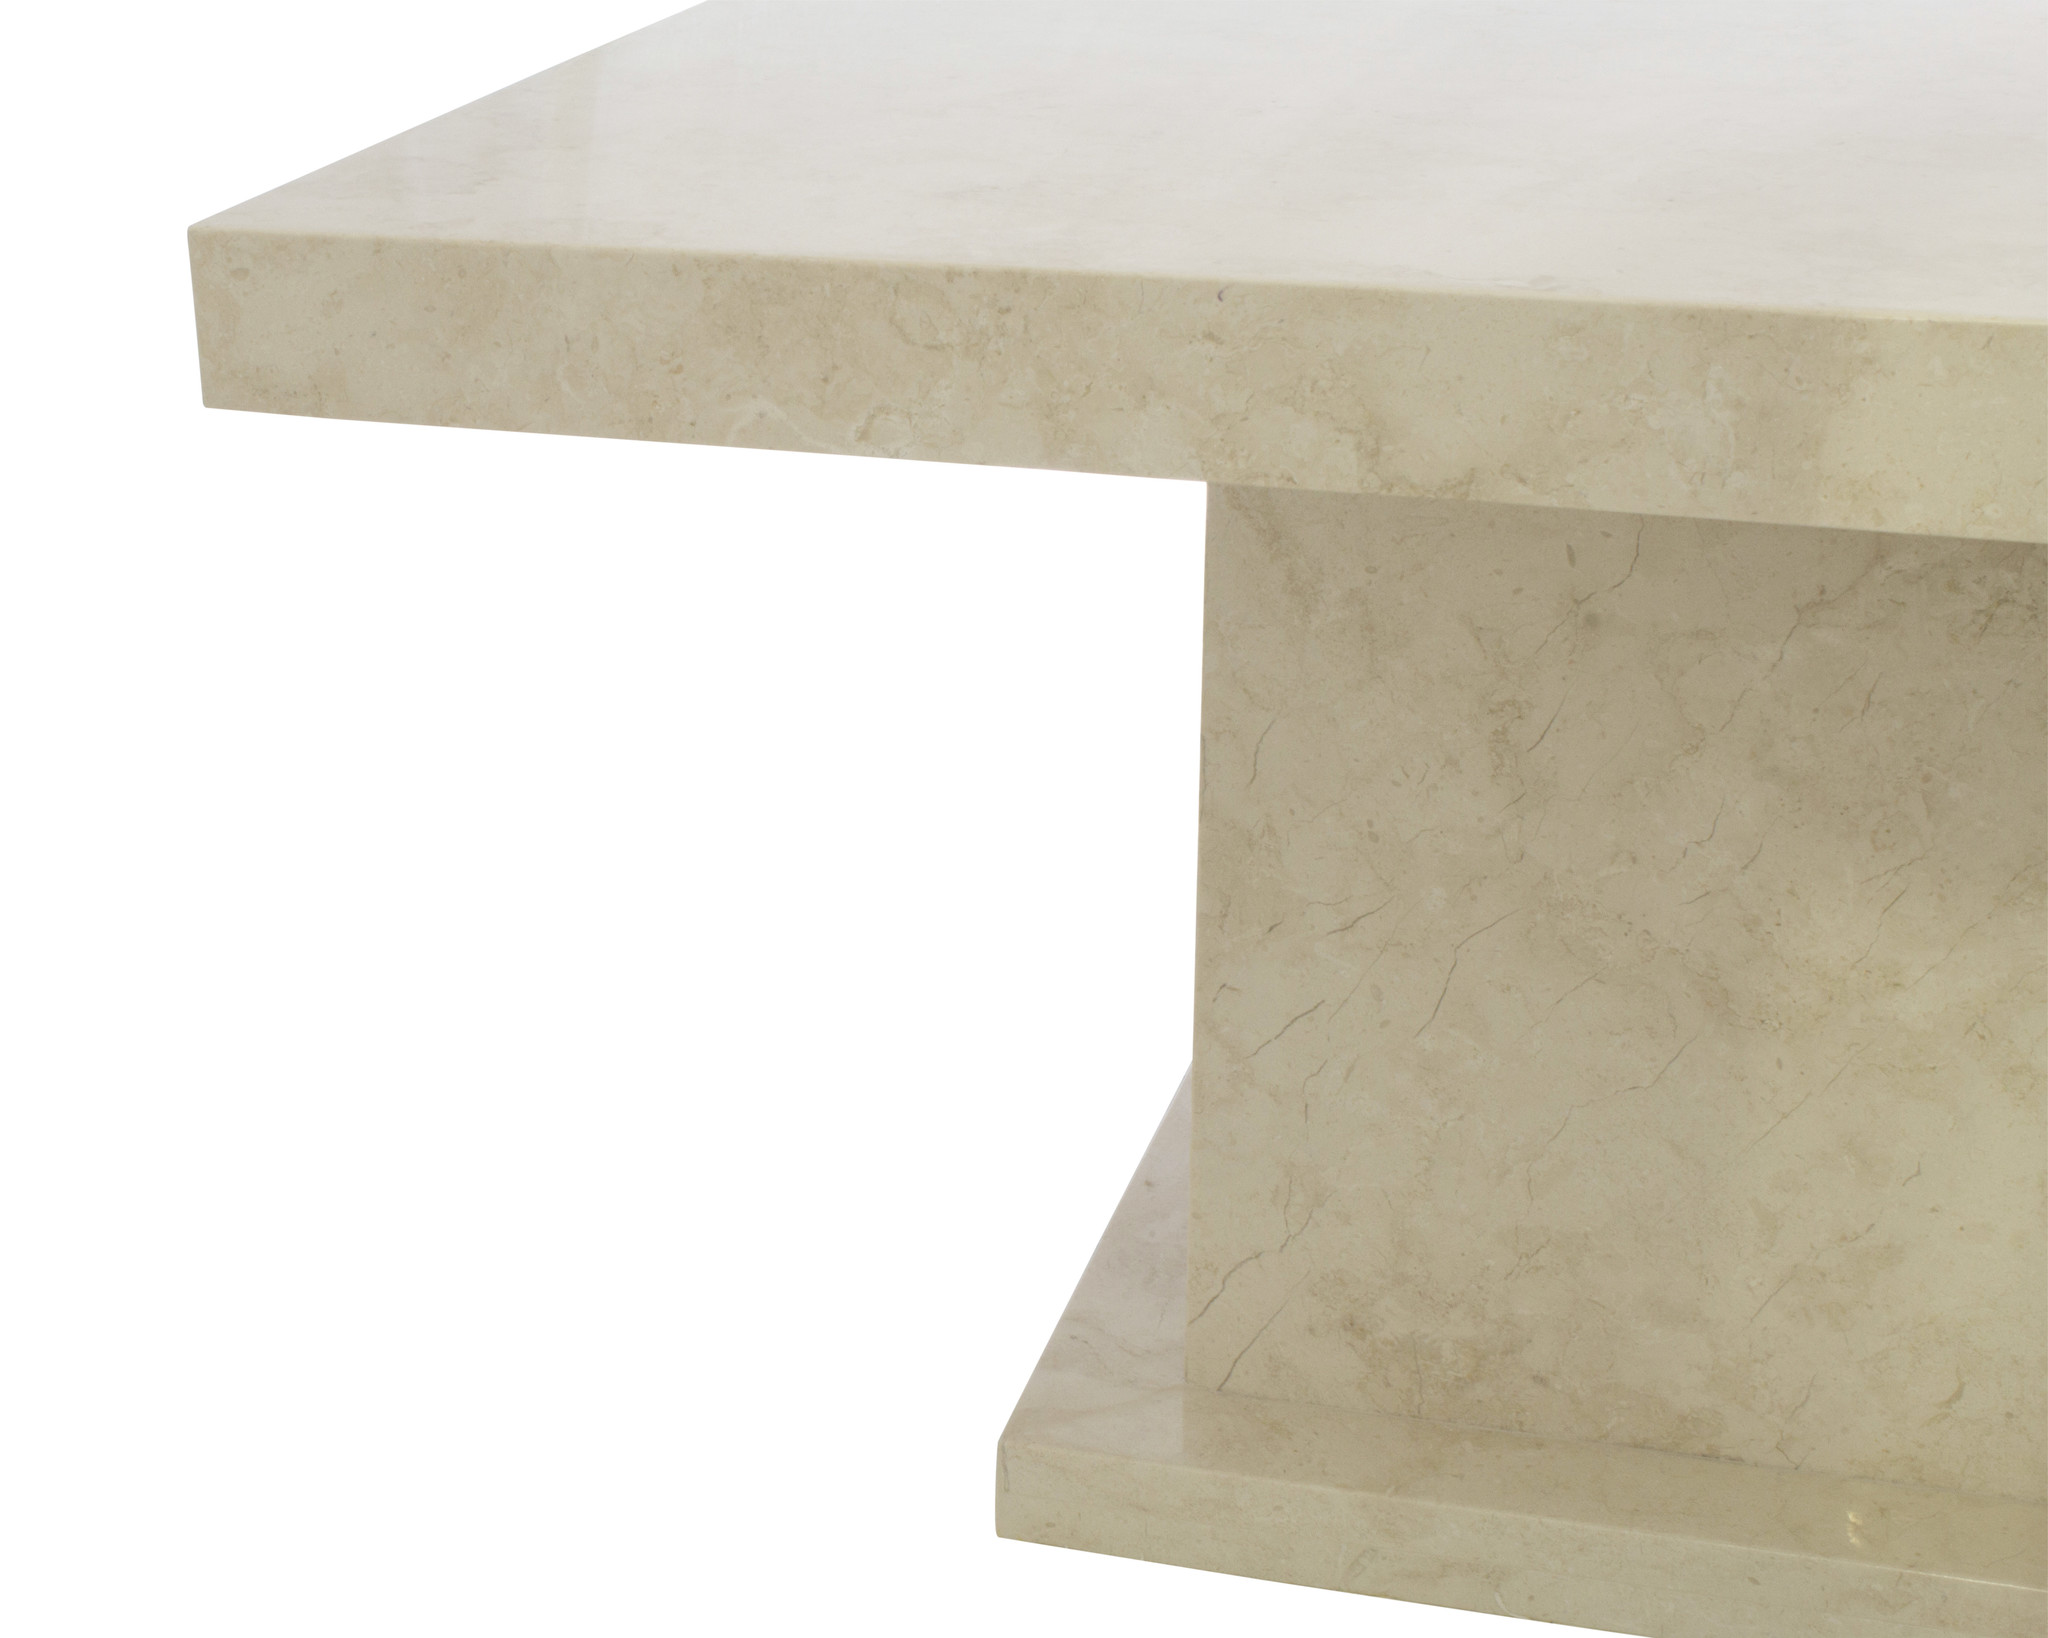 Indomarmer Couchtisch Rechteck 110x70x45 cm Creme Marmor